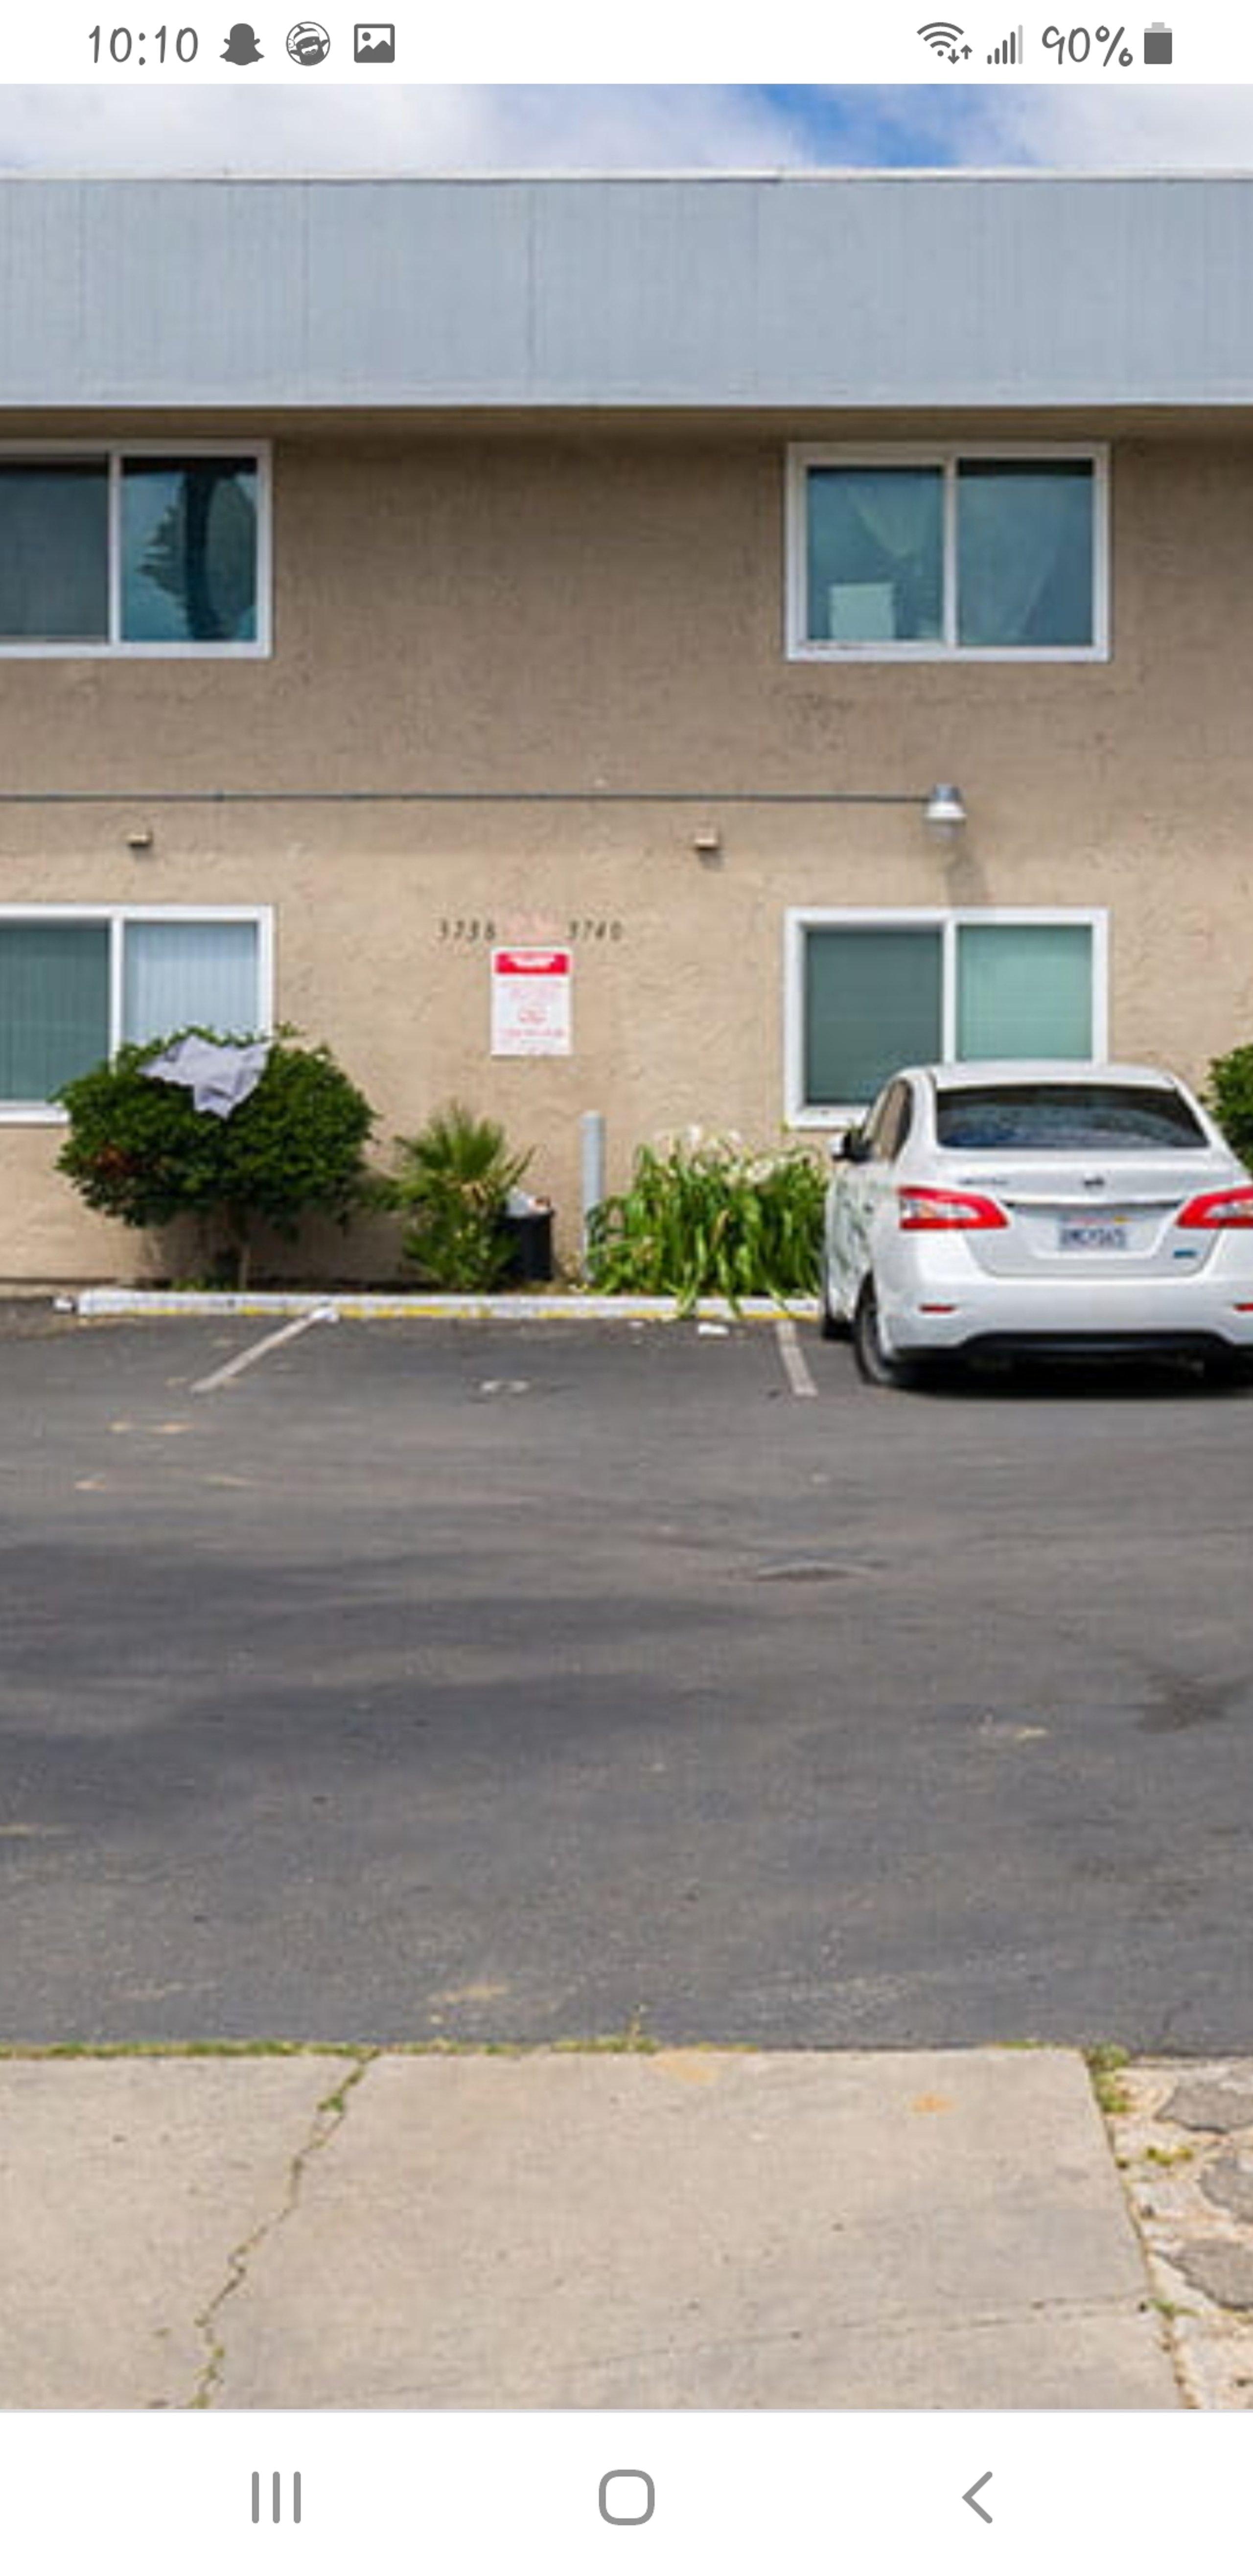 54x60 Parking Lot self storage unit